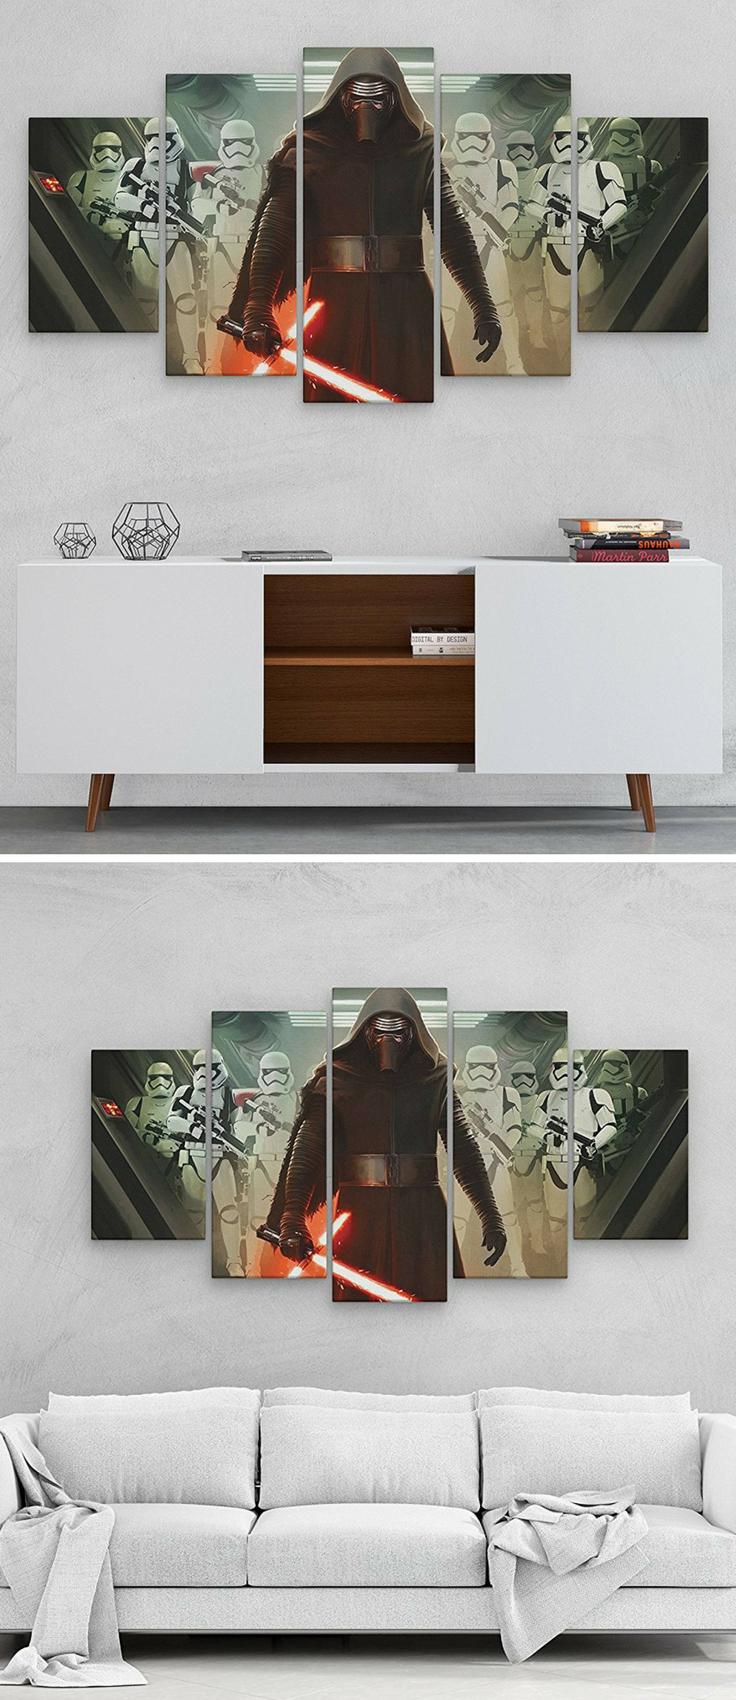 Star wars wall art canvas Барбершоп pinterest star wars gifts